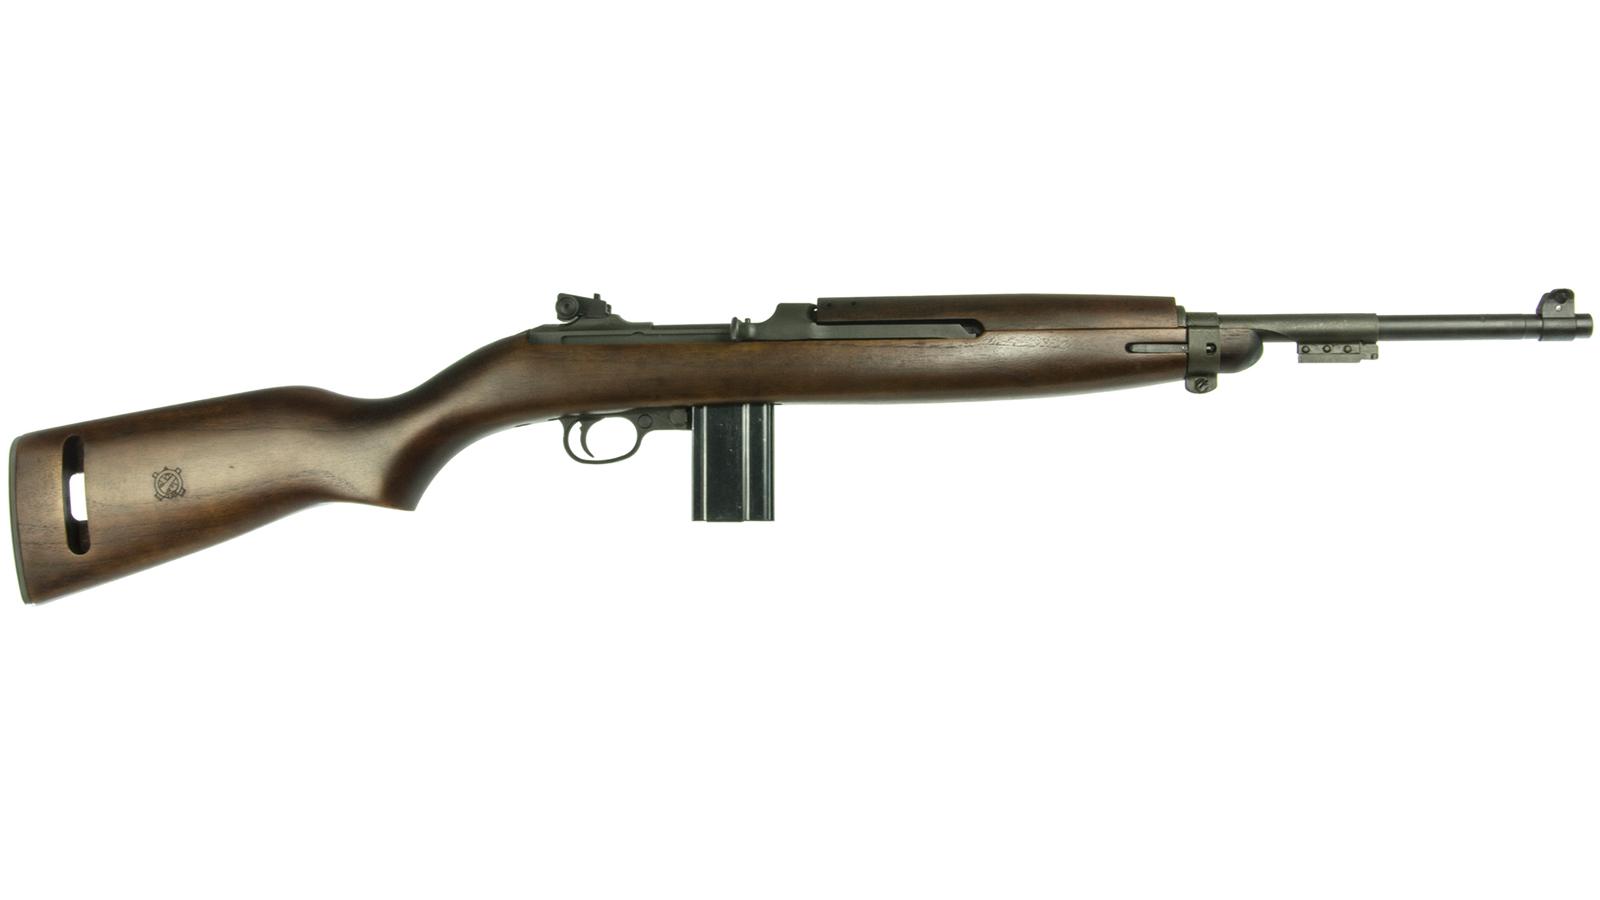 Inland Mfg ILM130 M1 1945 Carbine Semi-Automatic 30 Carbine 18 15+1 Walnut Stk Black in.